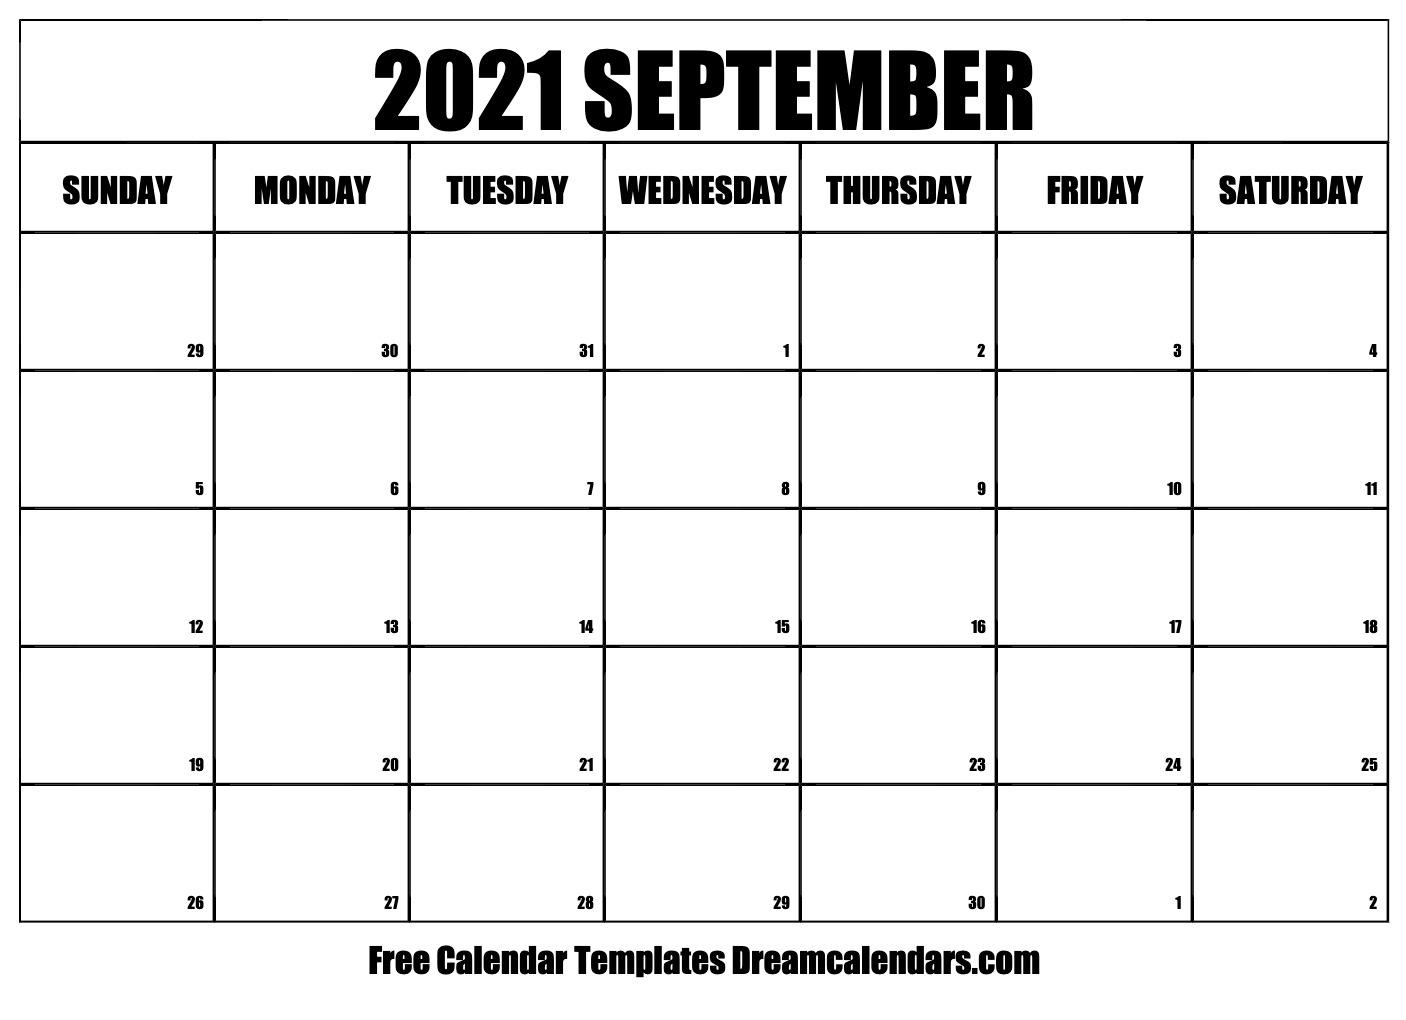 September 2021 Calendar | Free Blank Printable Templates Printable Calendar September 2020 To September 2021